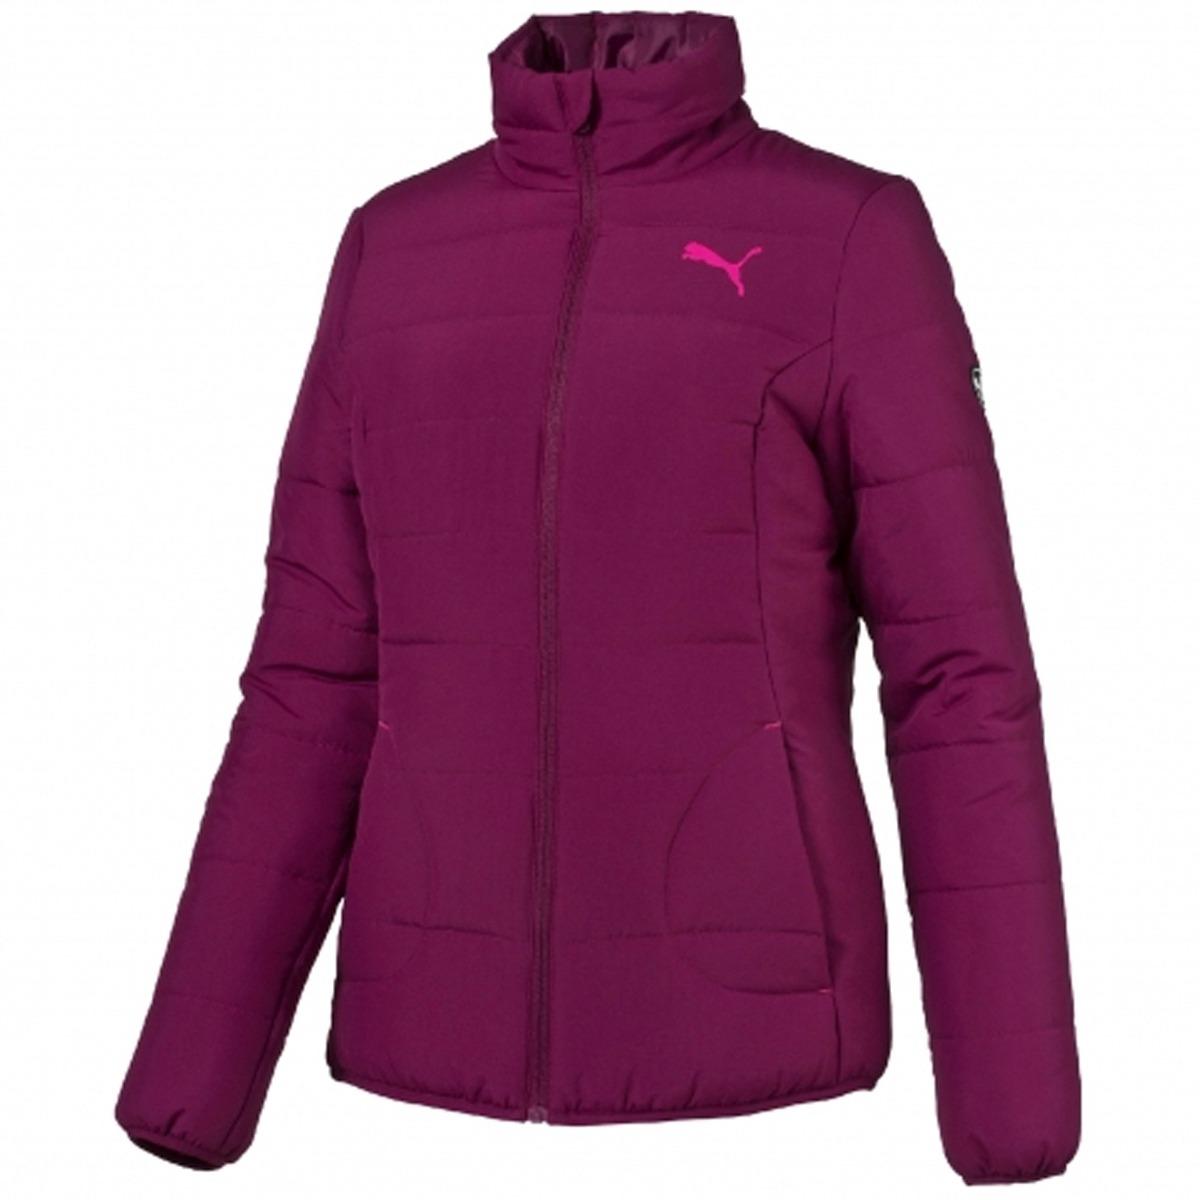 b85a12171 comprar puma ropa deportiva mujer baratas